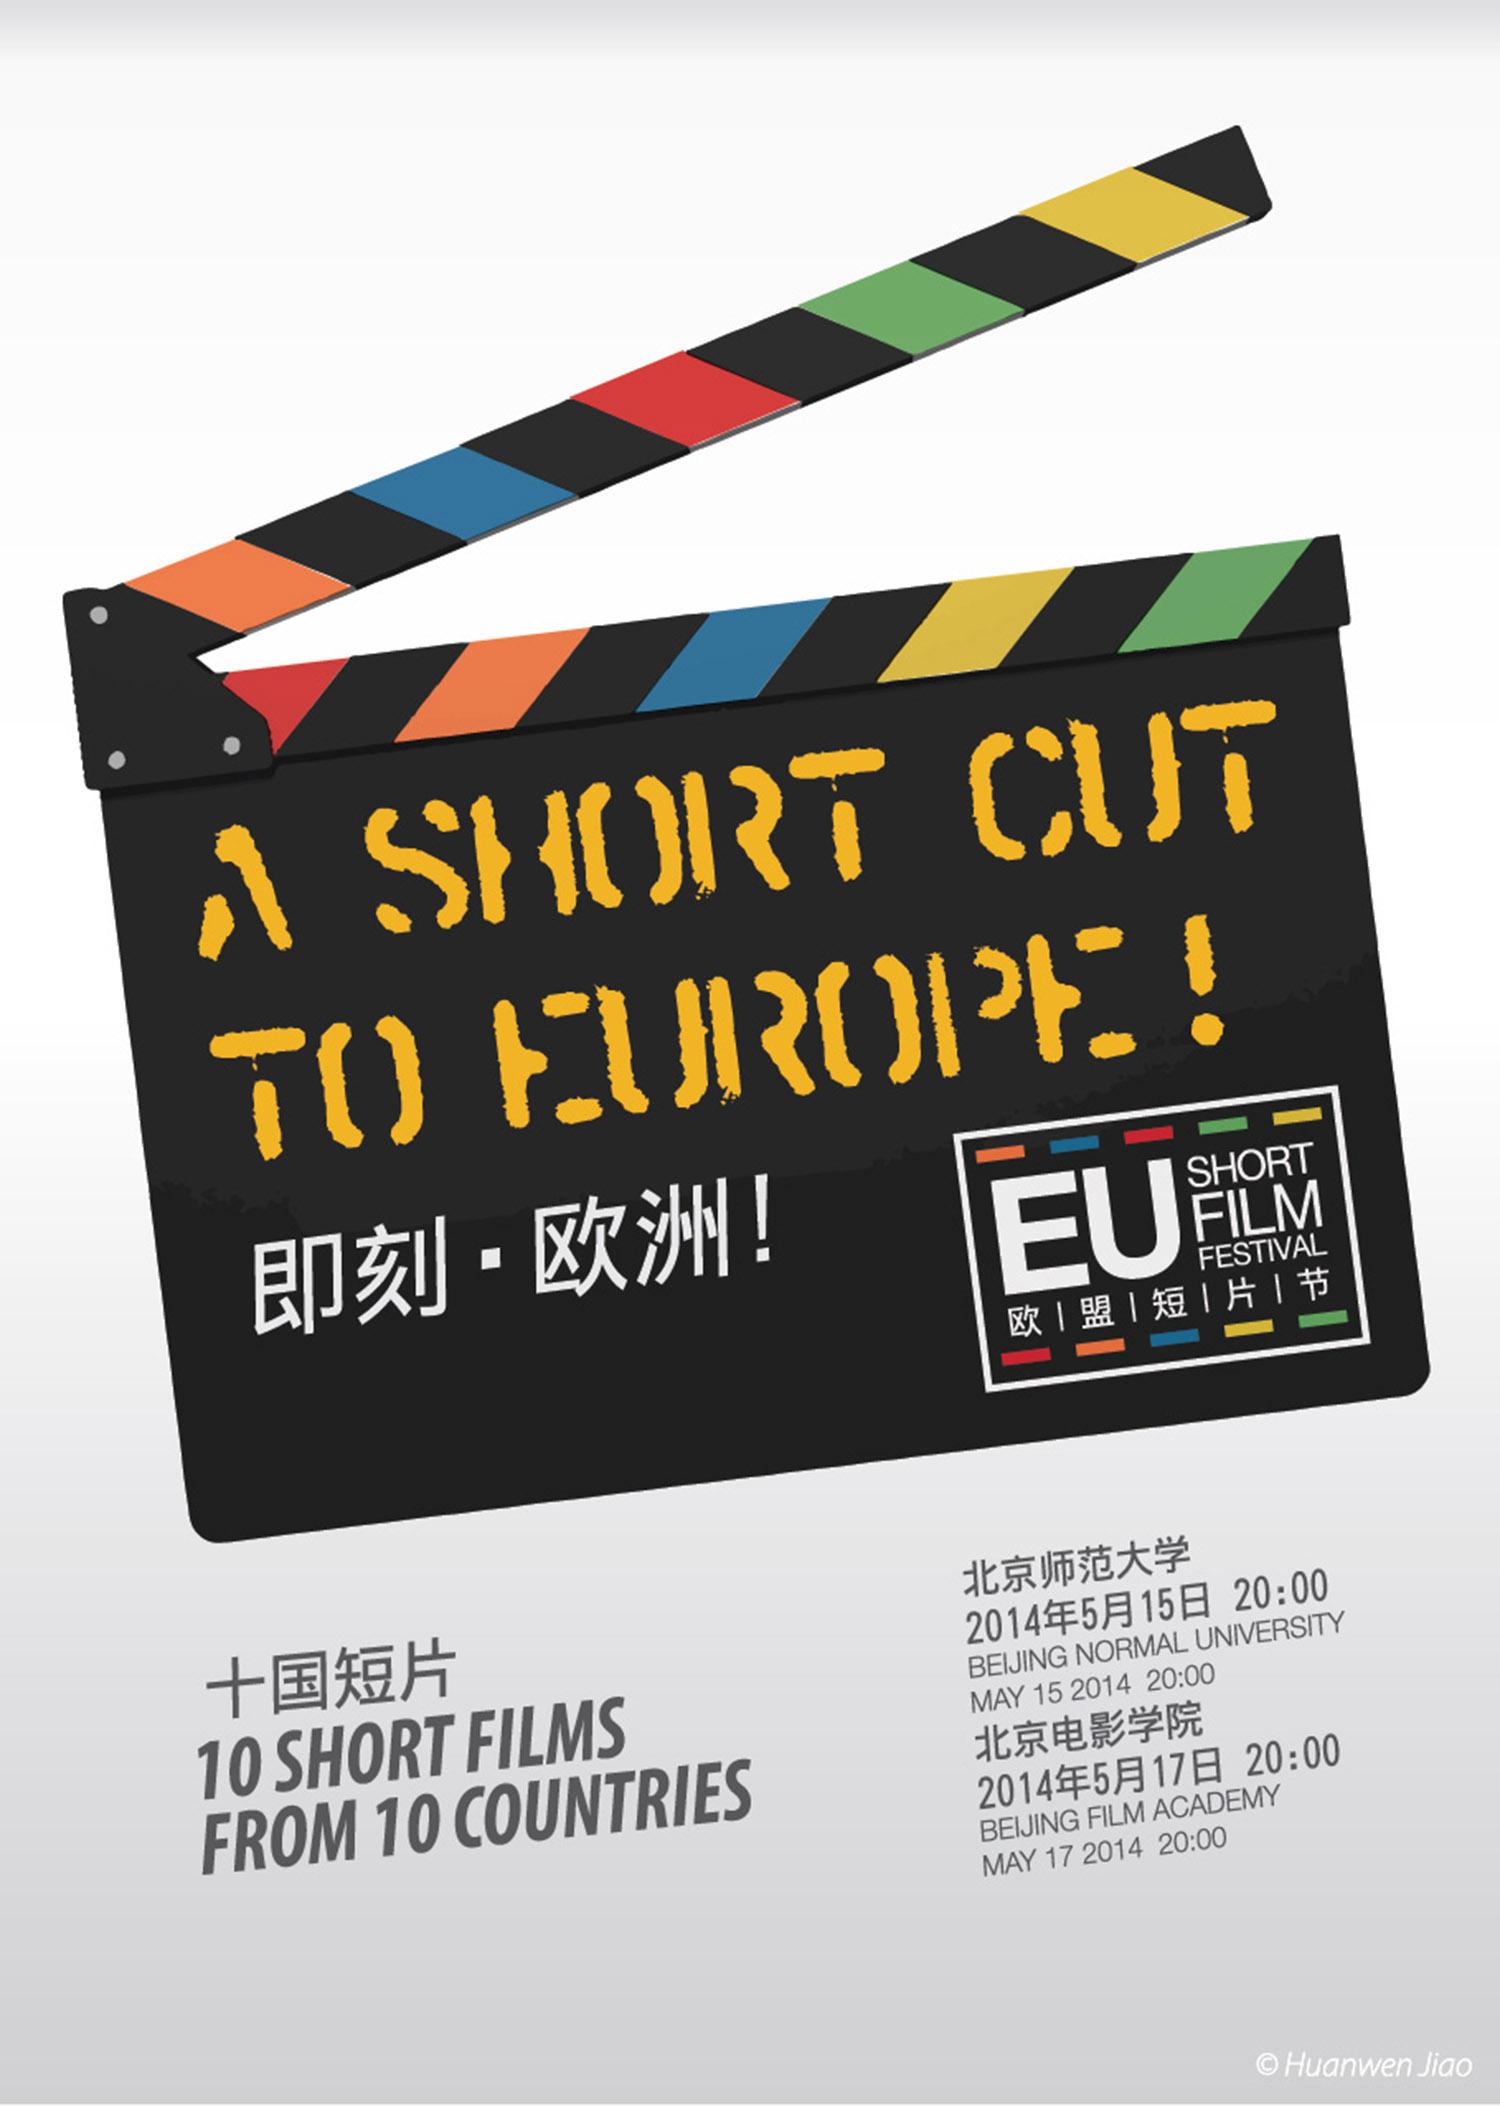 EU_short_film_festival_proposal-21.jpg